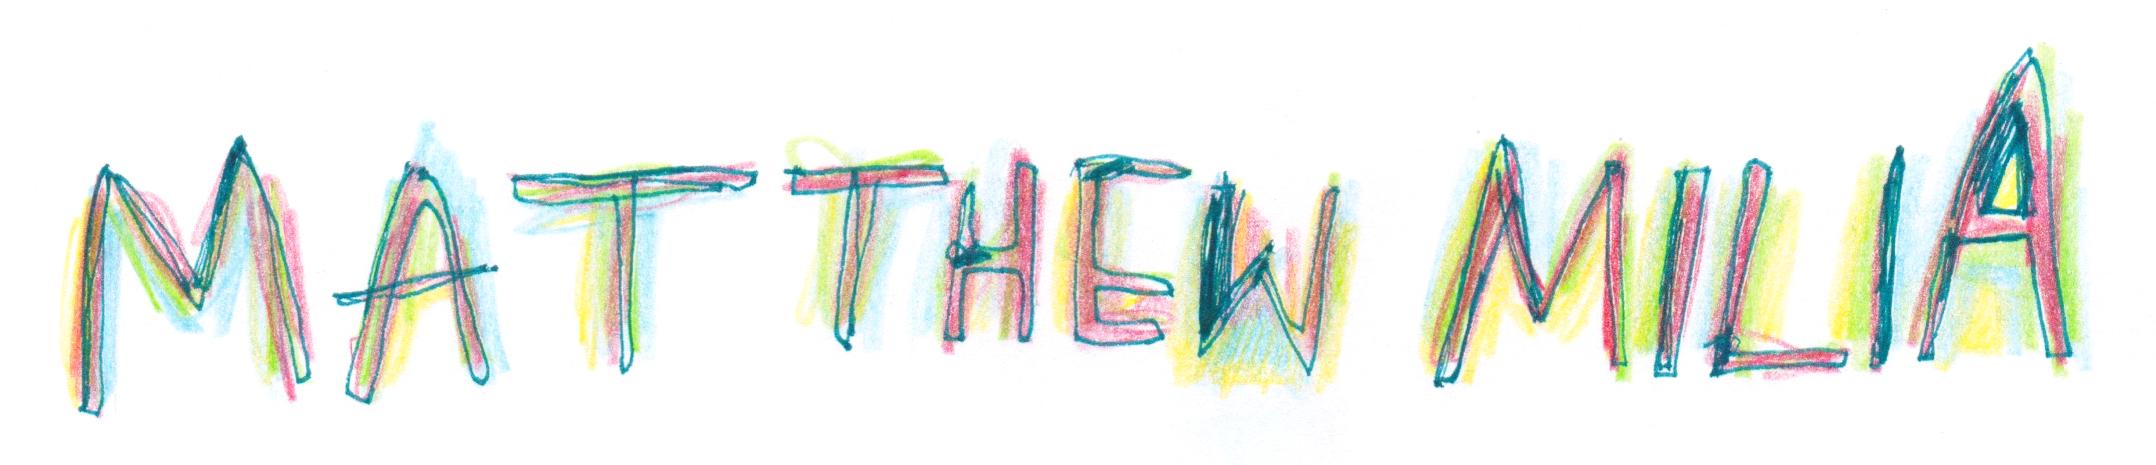 MM pencil logo.jpeg